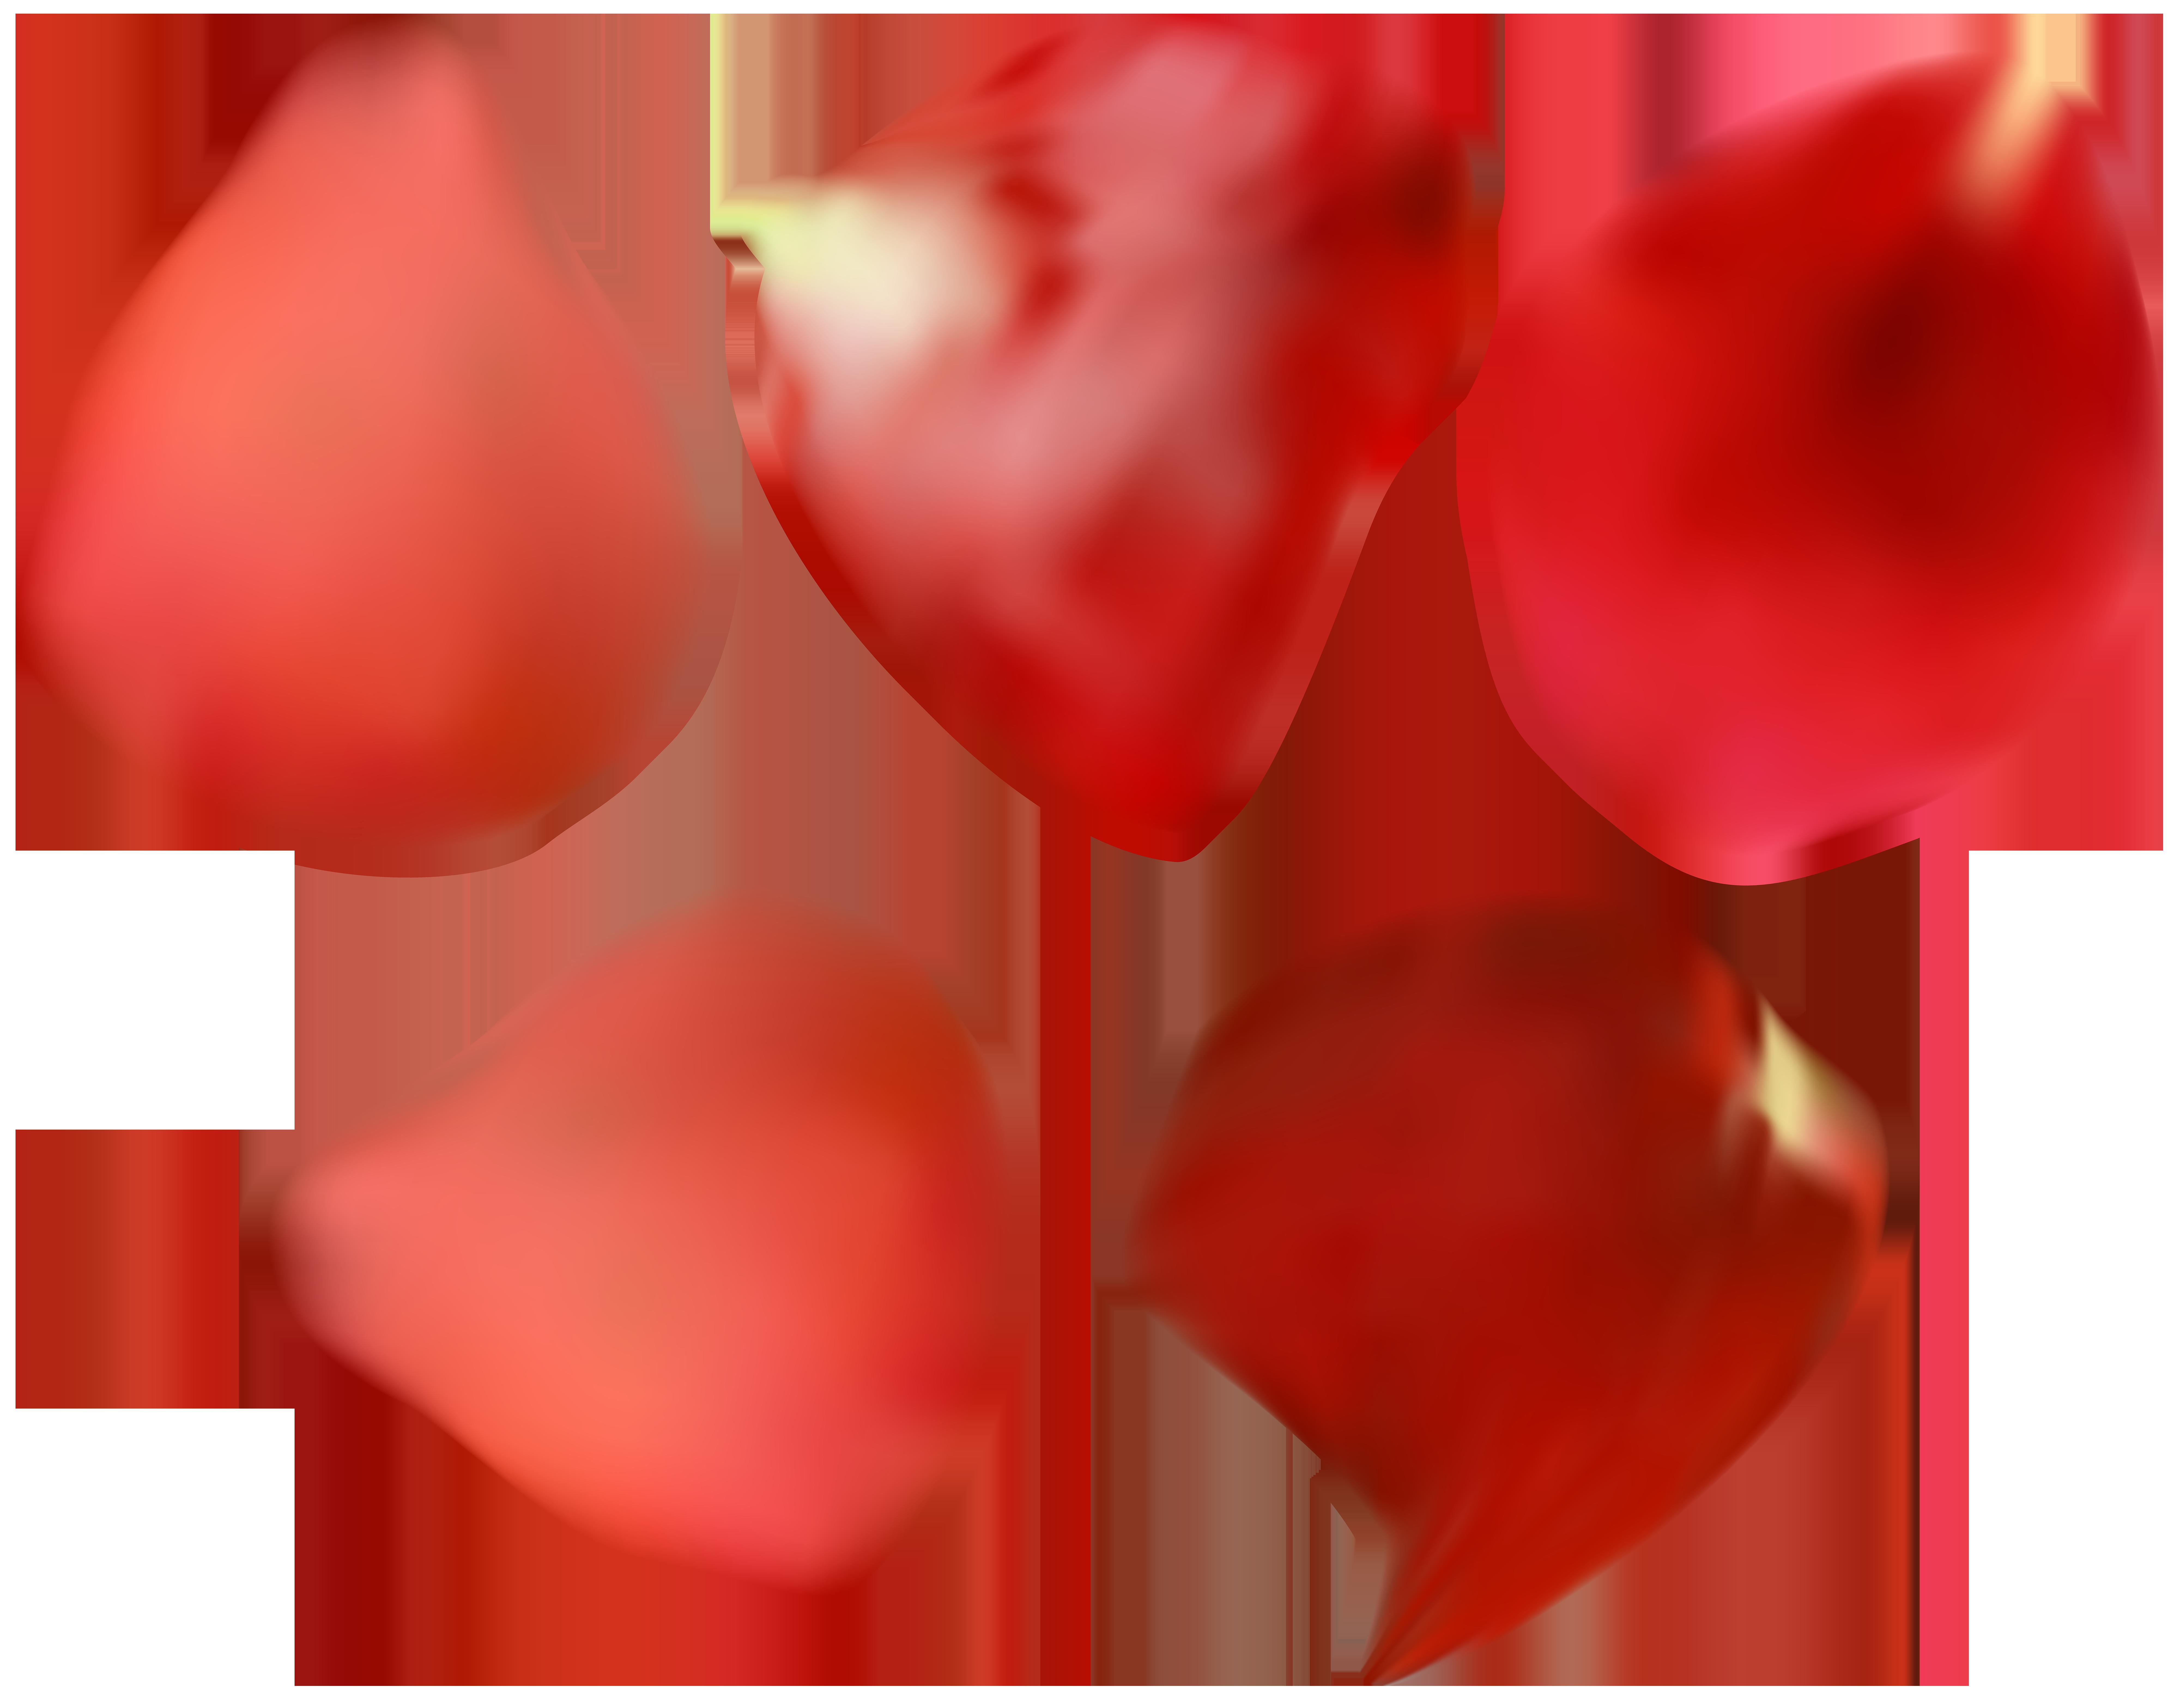 Red transparent png image. Clipart rose rose petal